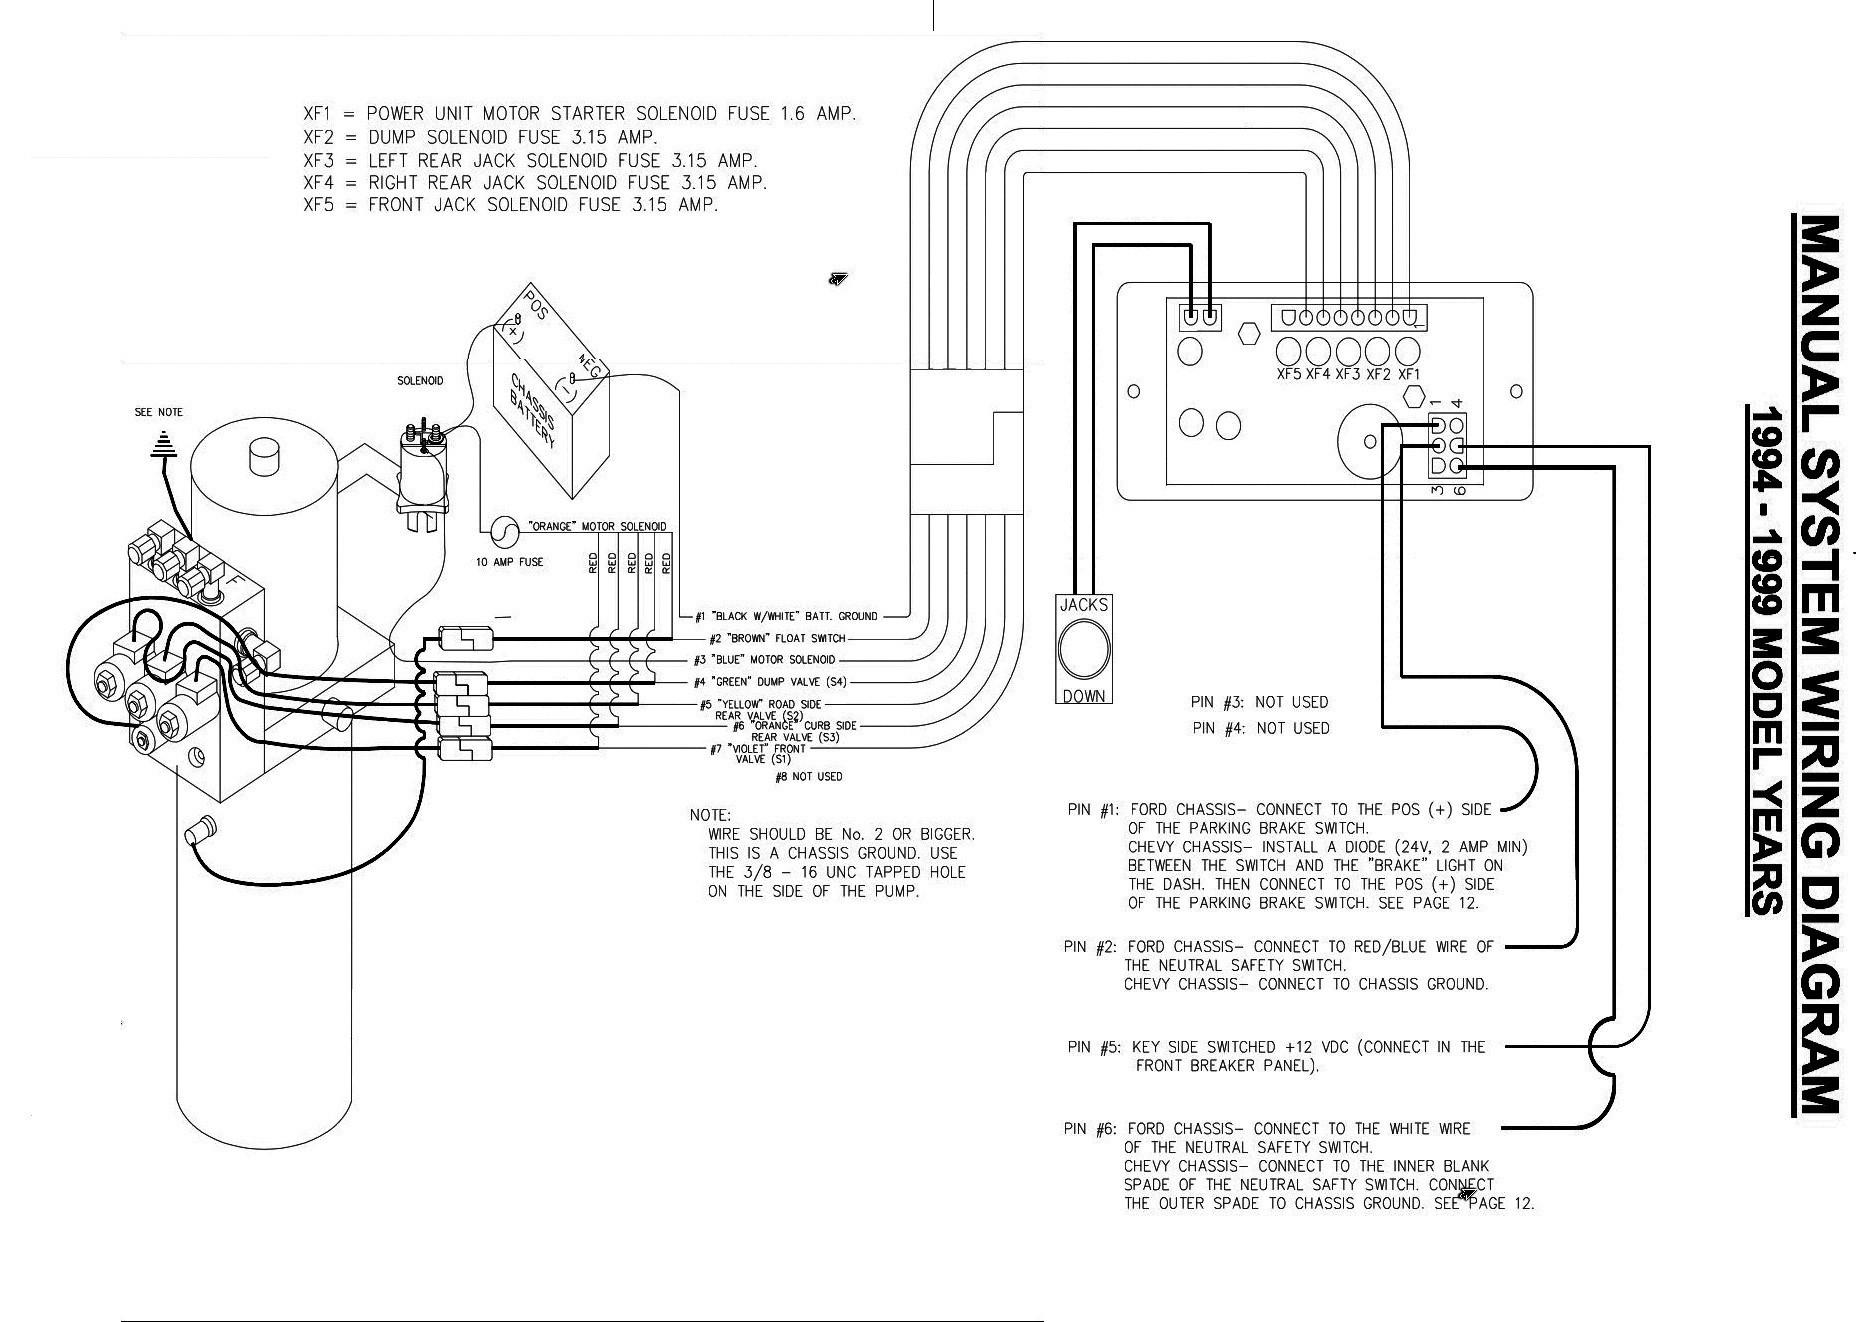 coachmen wiring diagram newmar wiring diagrams com coachmen rv